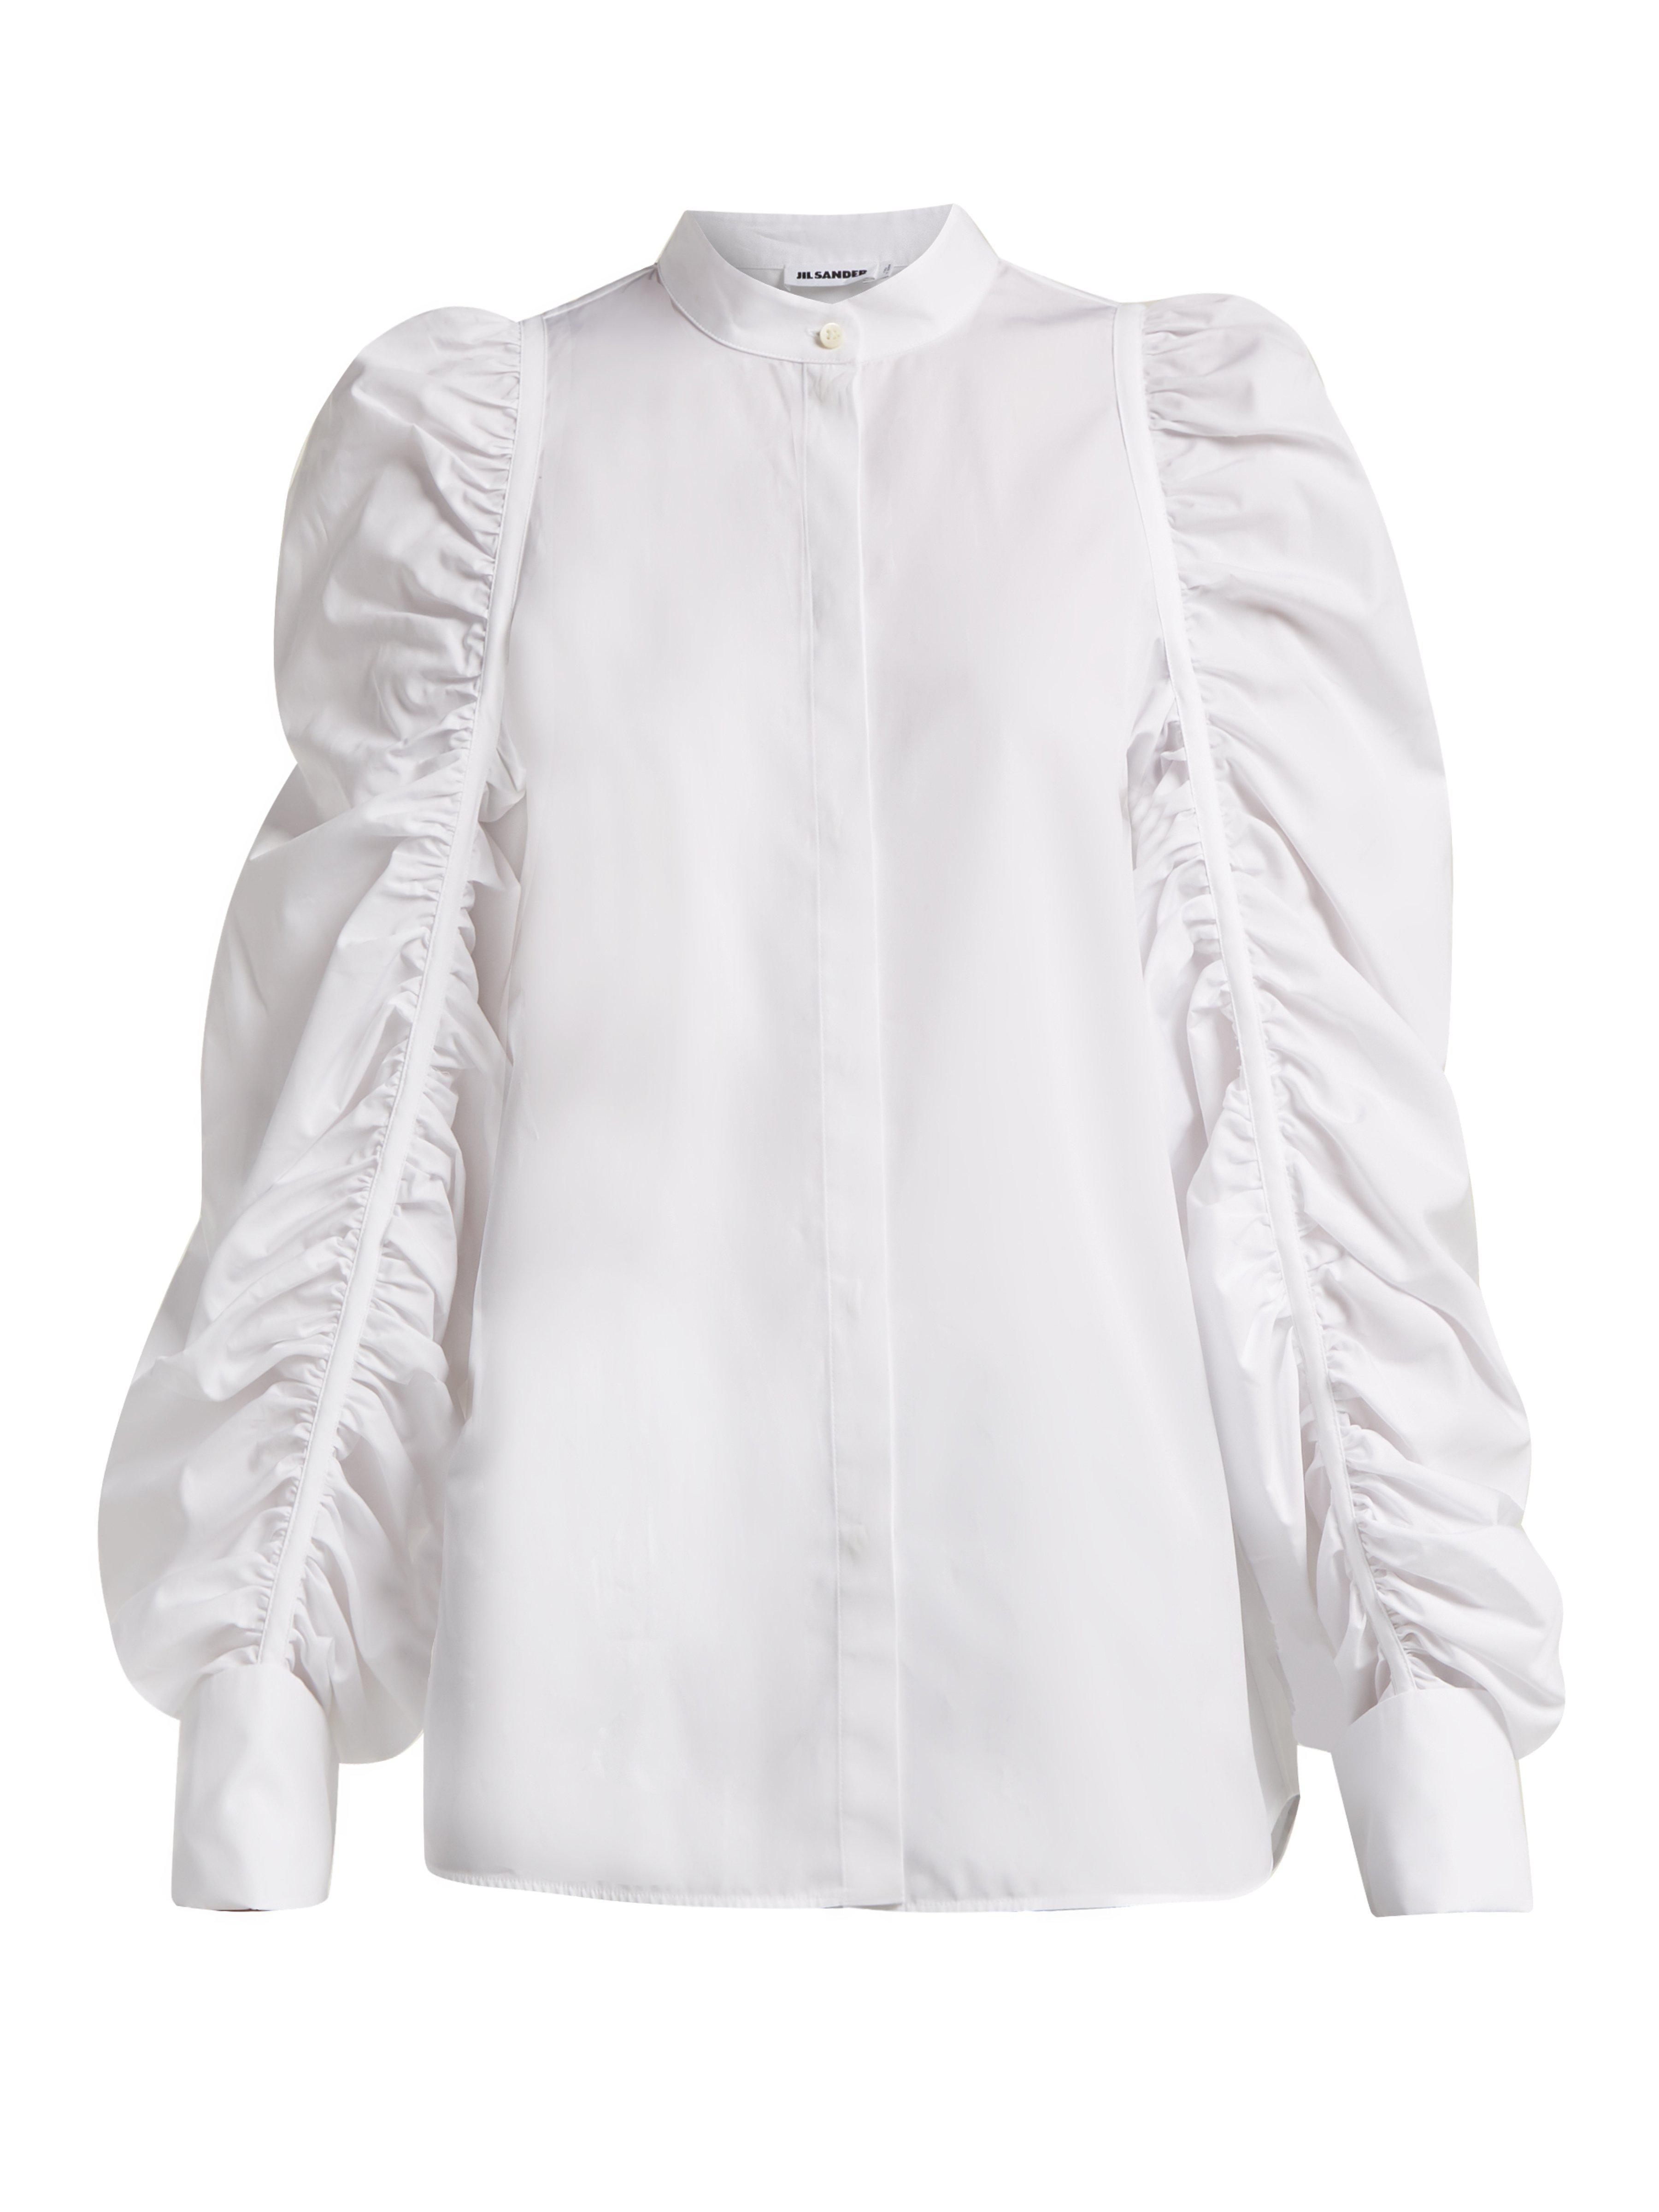 637ffffc Jil Sander Ruched Sleeve Cotton Shirt in White - Lyst